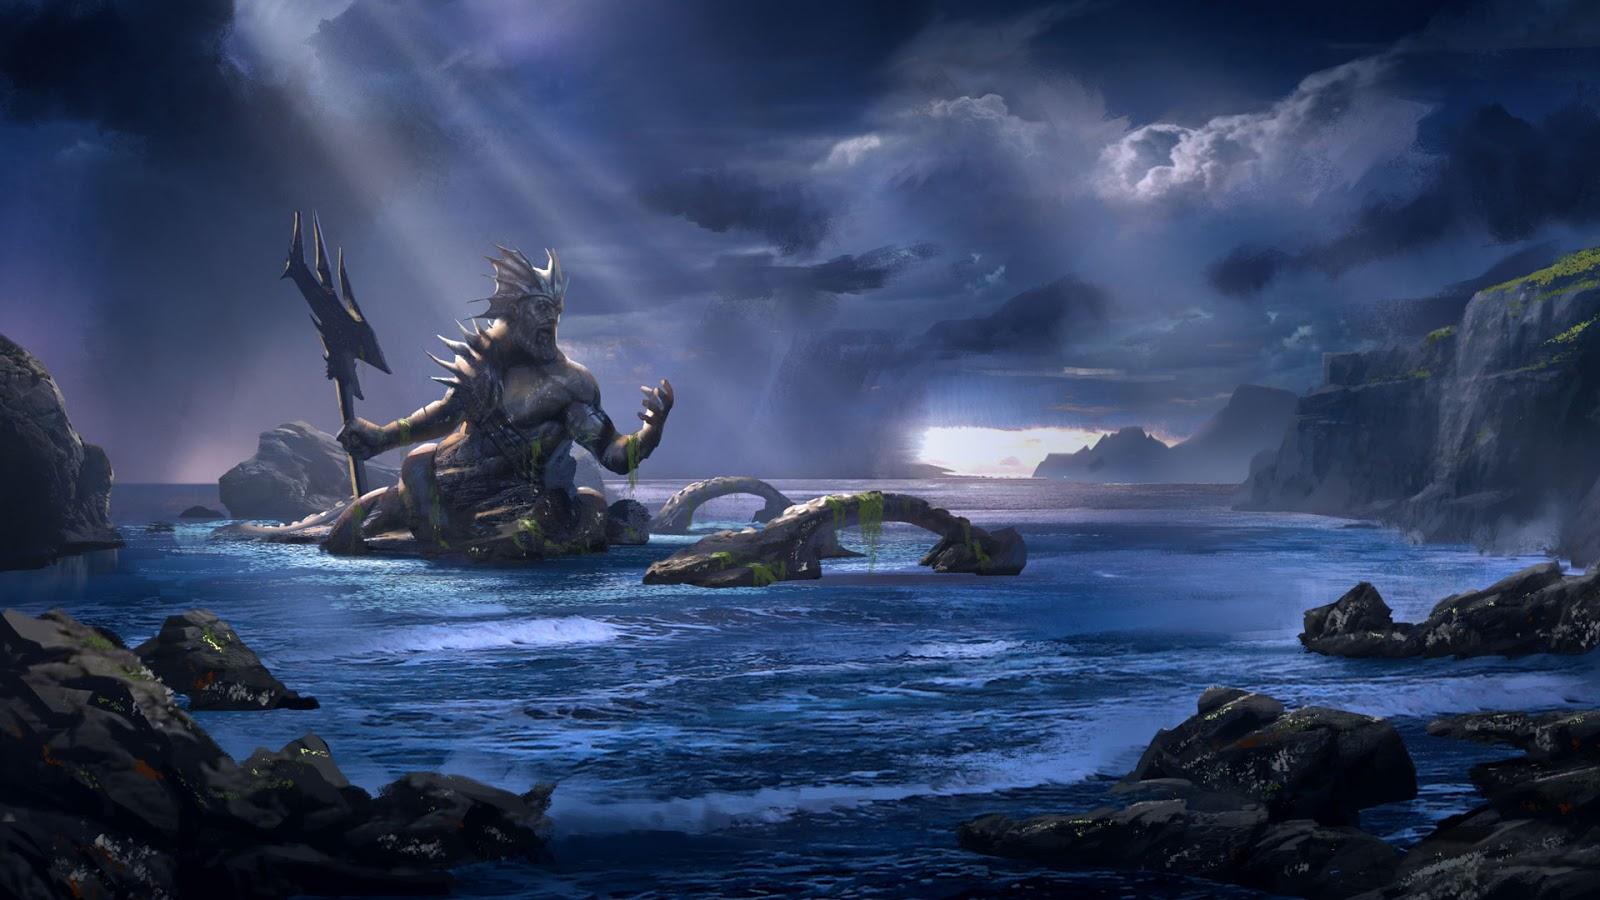 Best 52 Gods of Olympus Wallpaper on HipWallpaper Battle Gods 1600x900